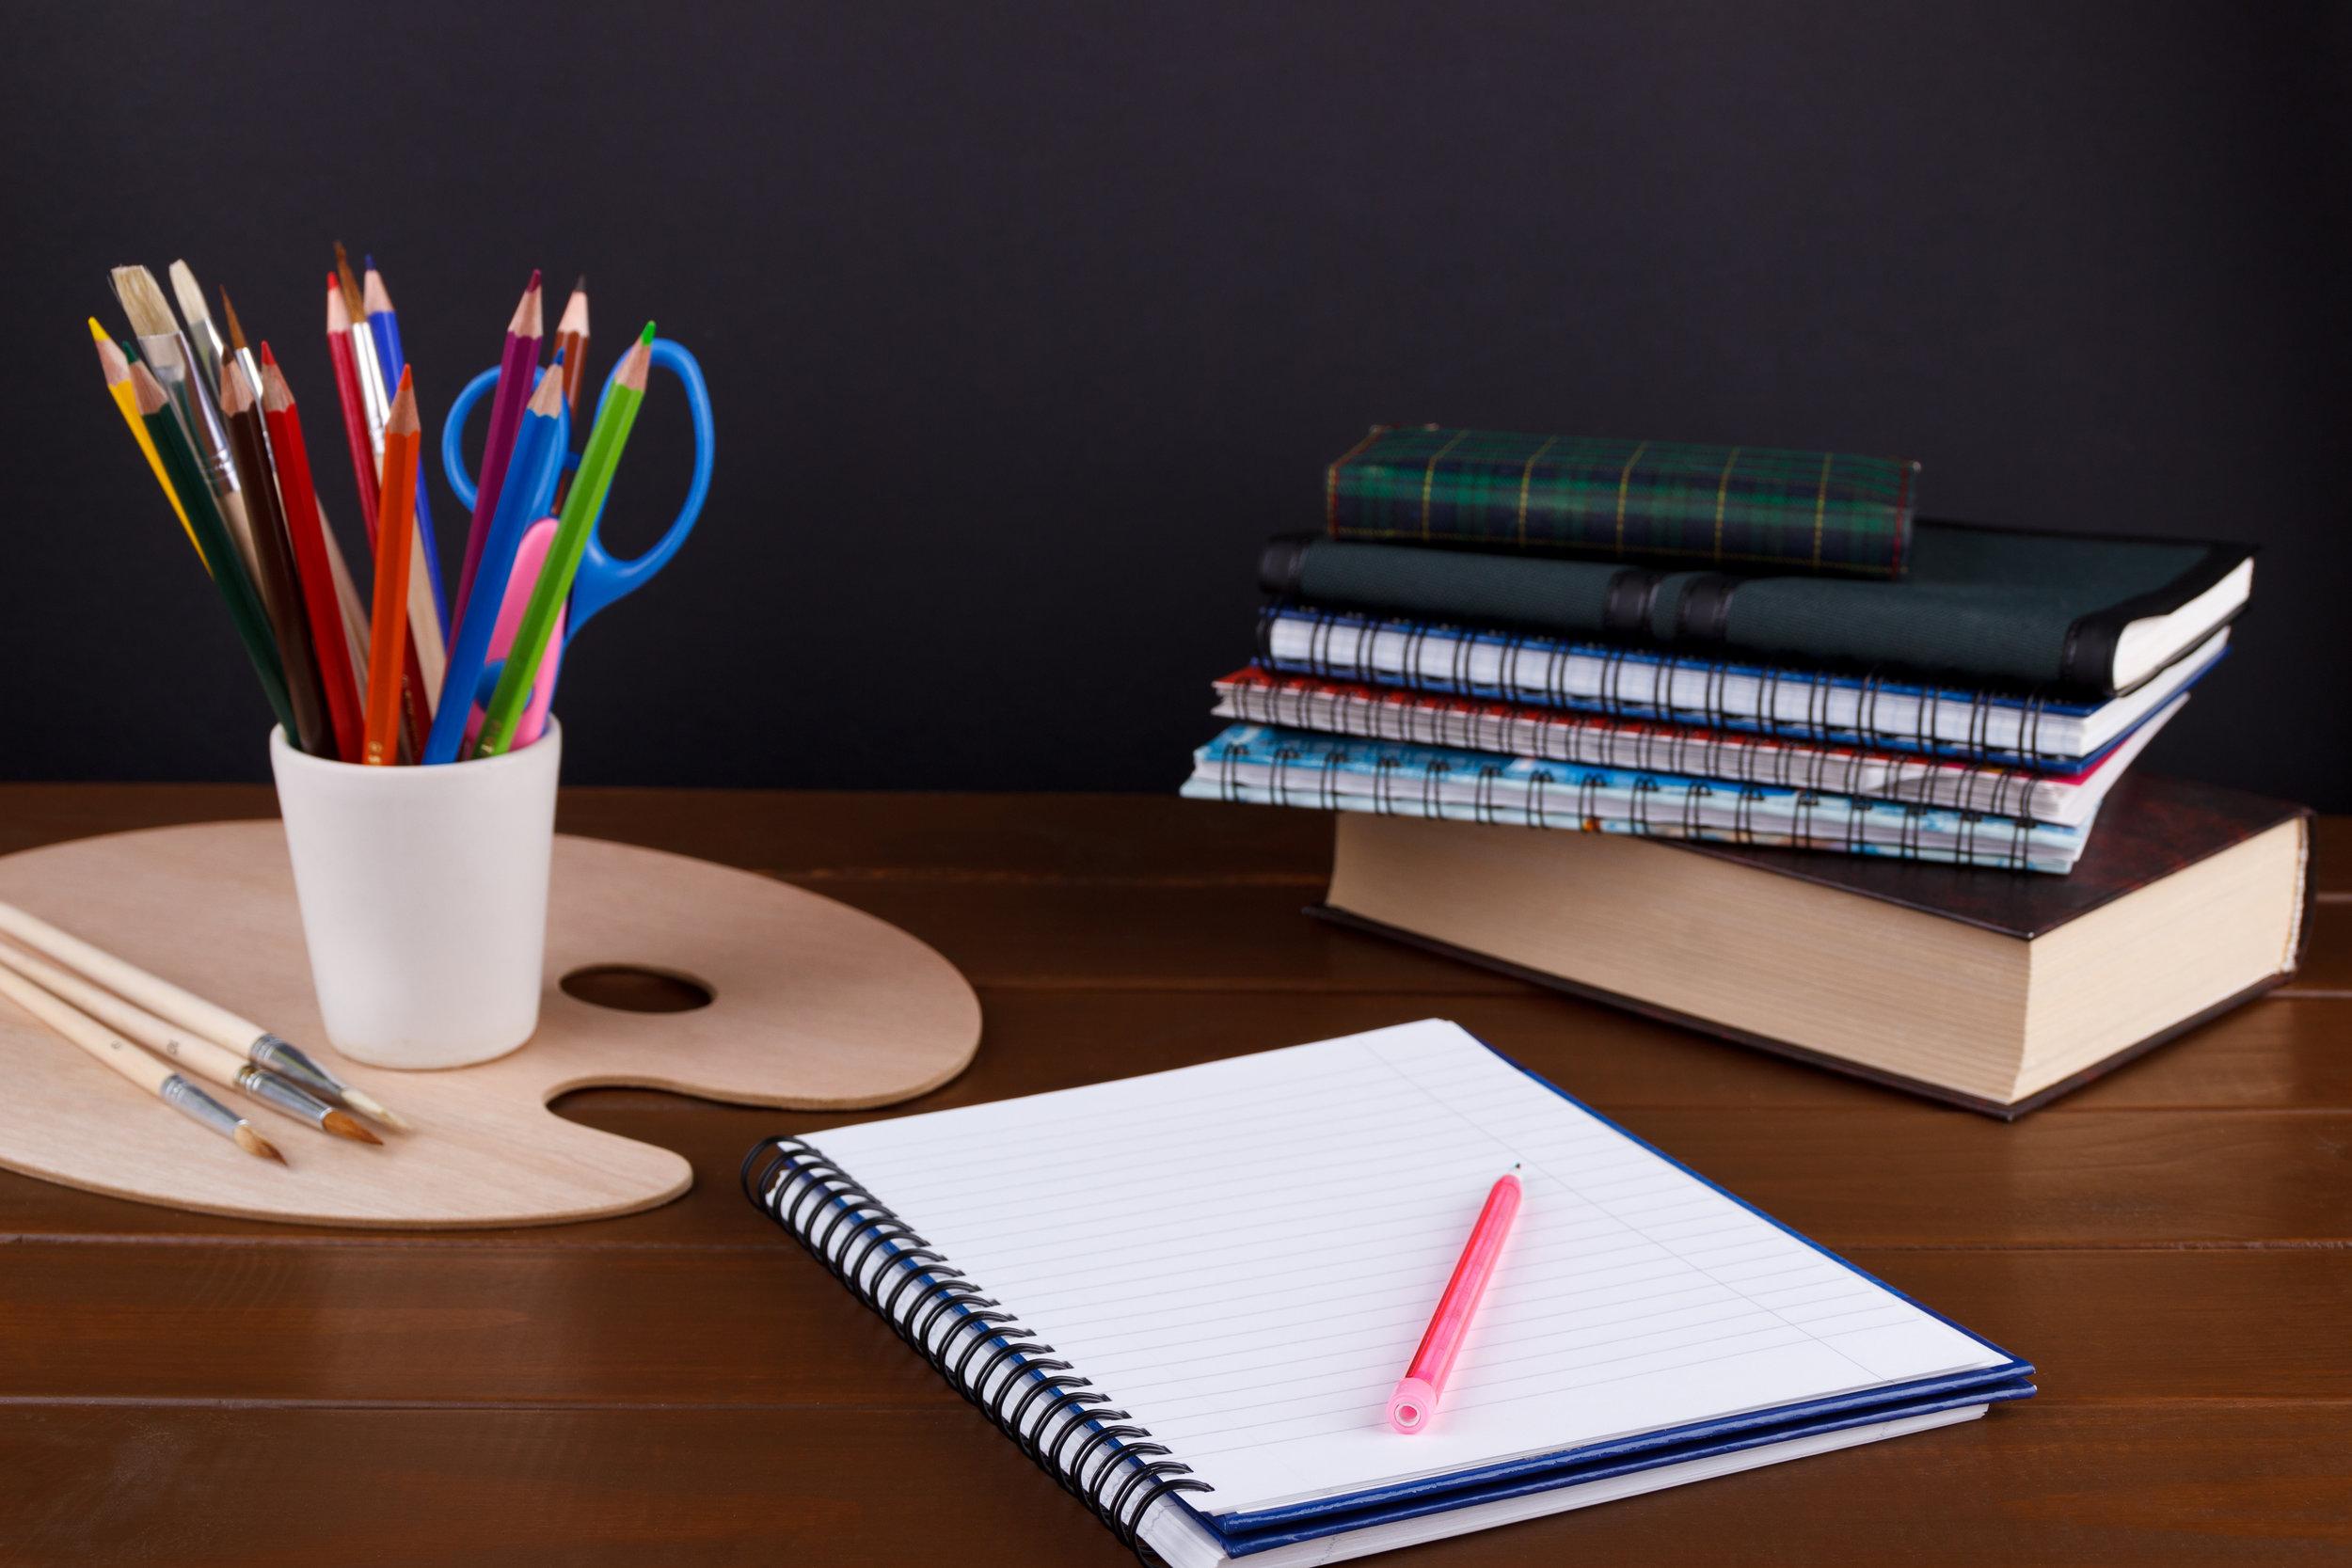 student-studies-accessories-PVHH5DA.jpg